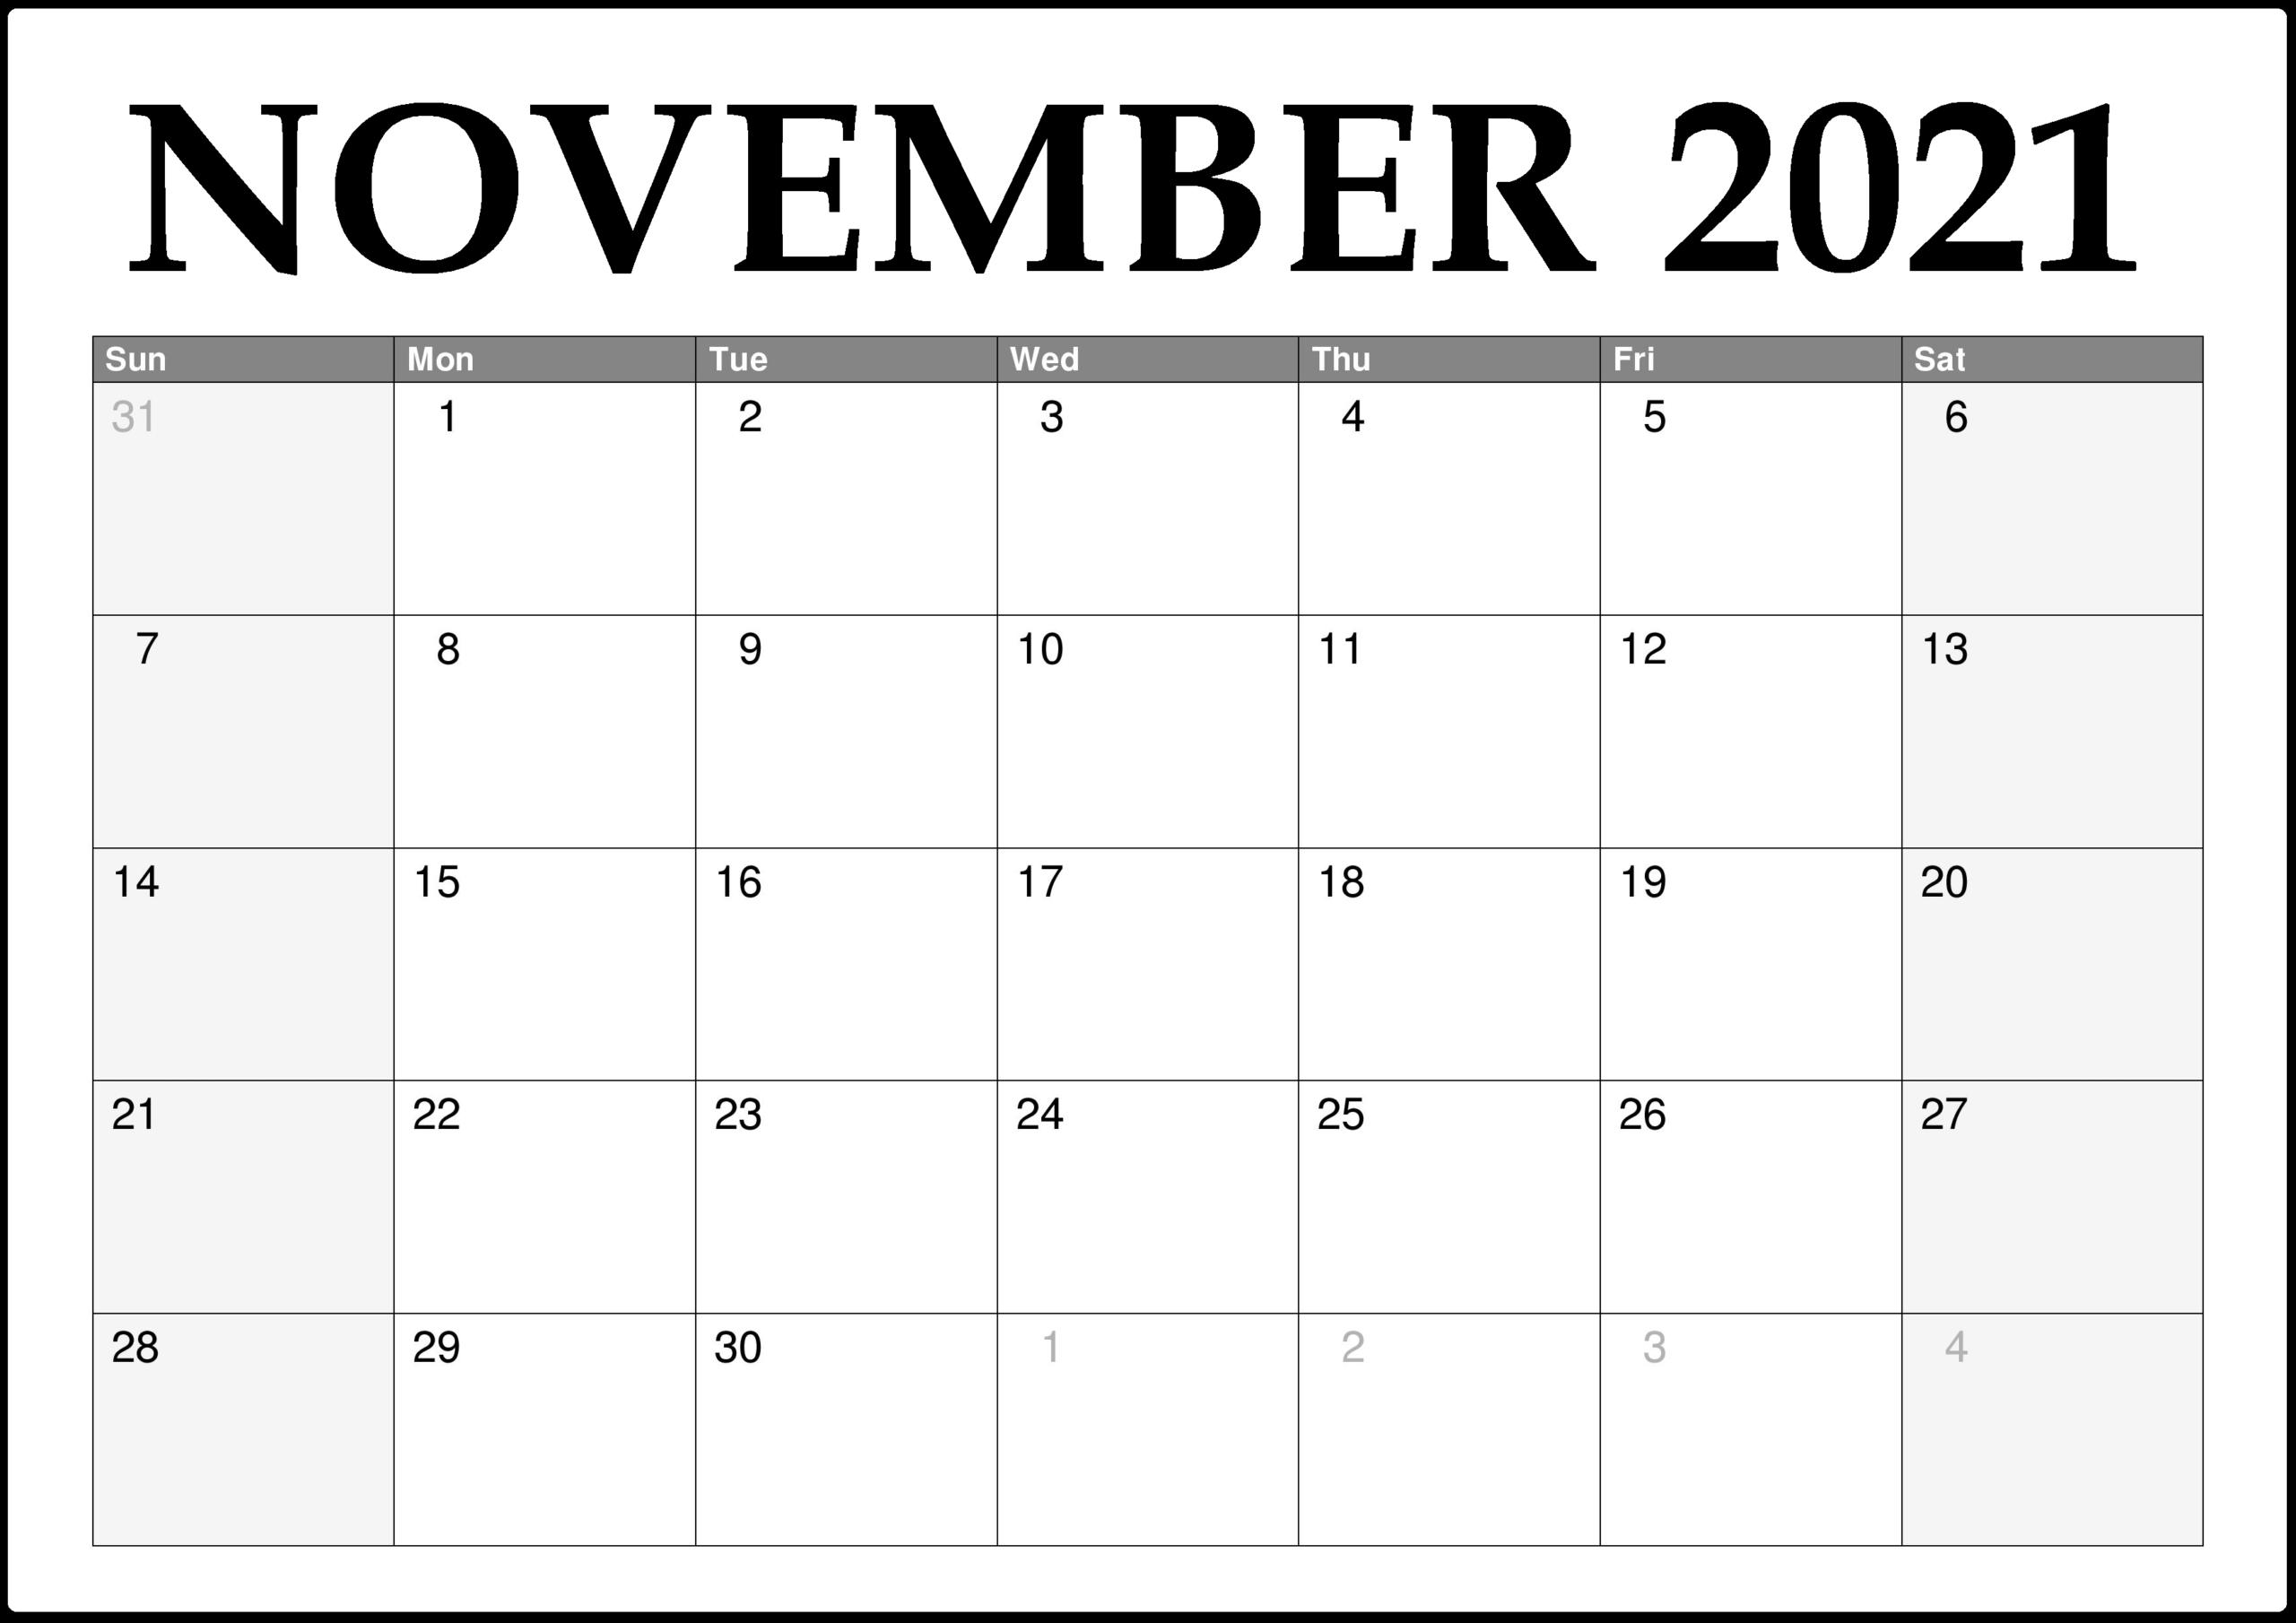 November 2021 Editable Calendar